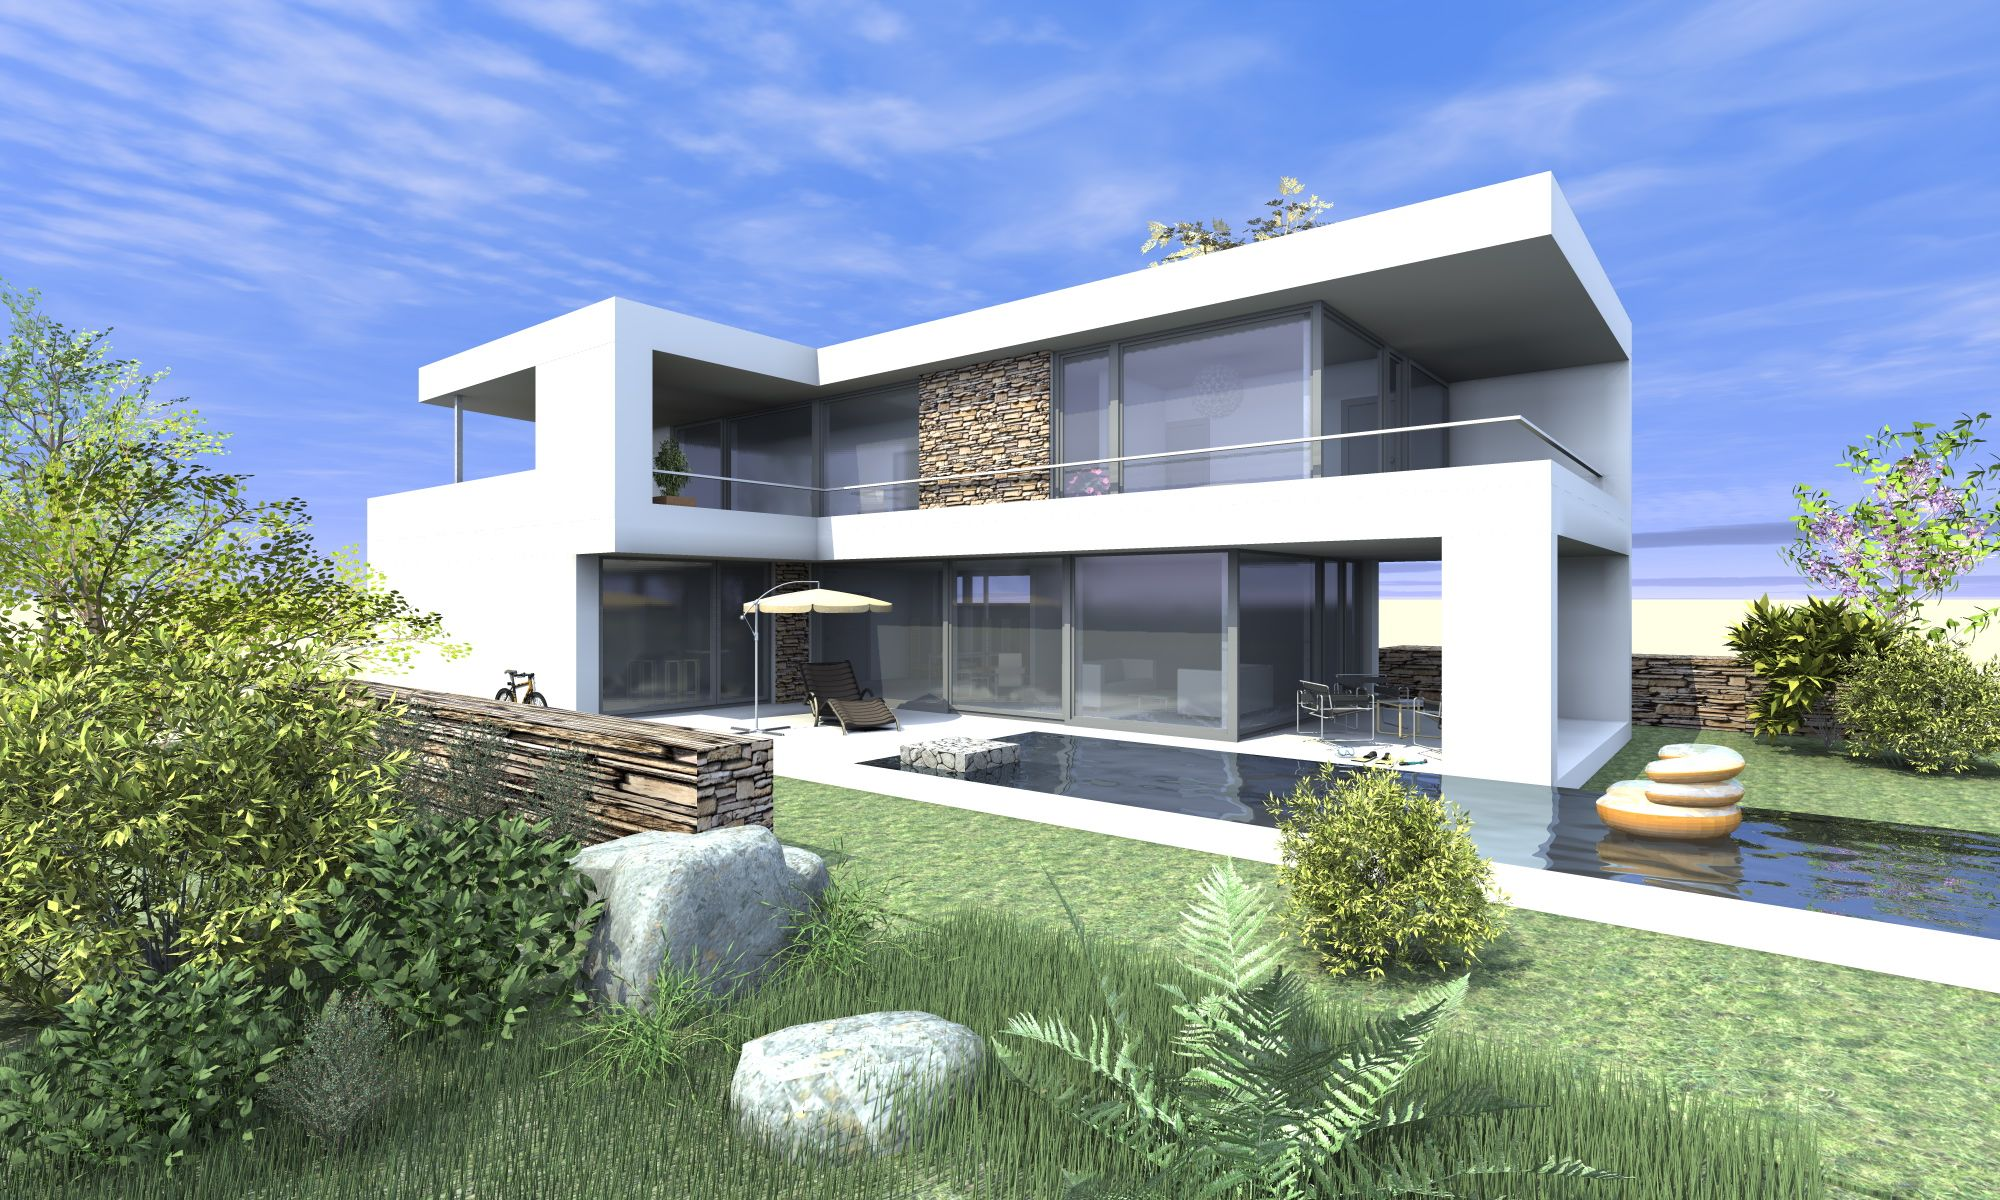 Planungsbüro AVANTECTURE > Neubau in moderner Architektur